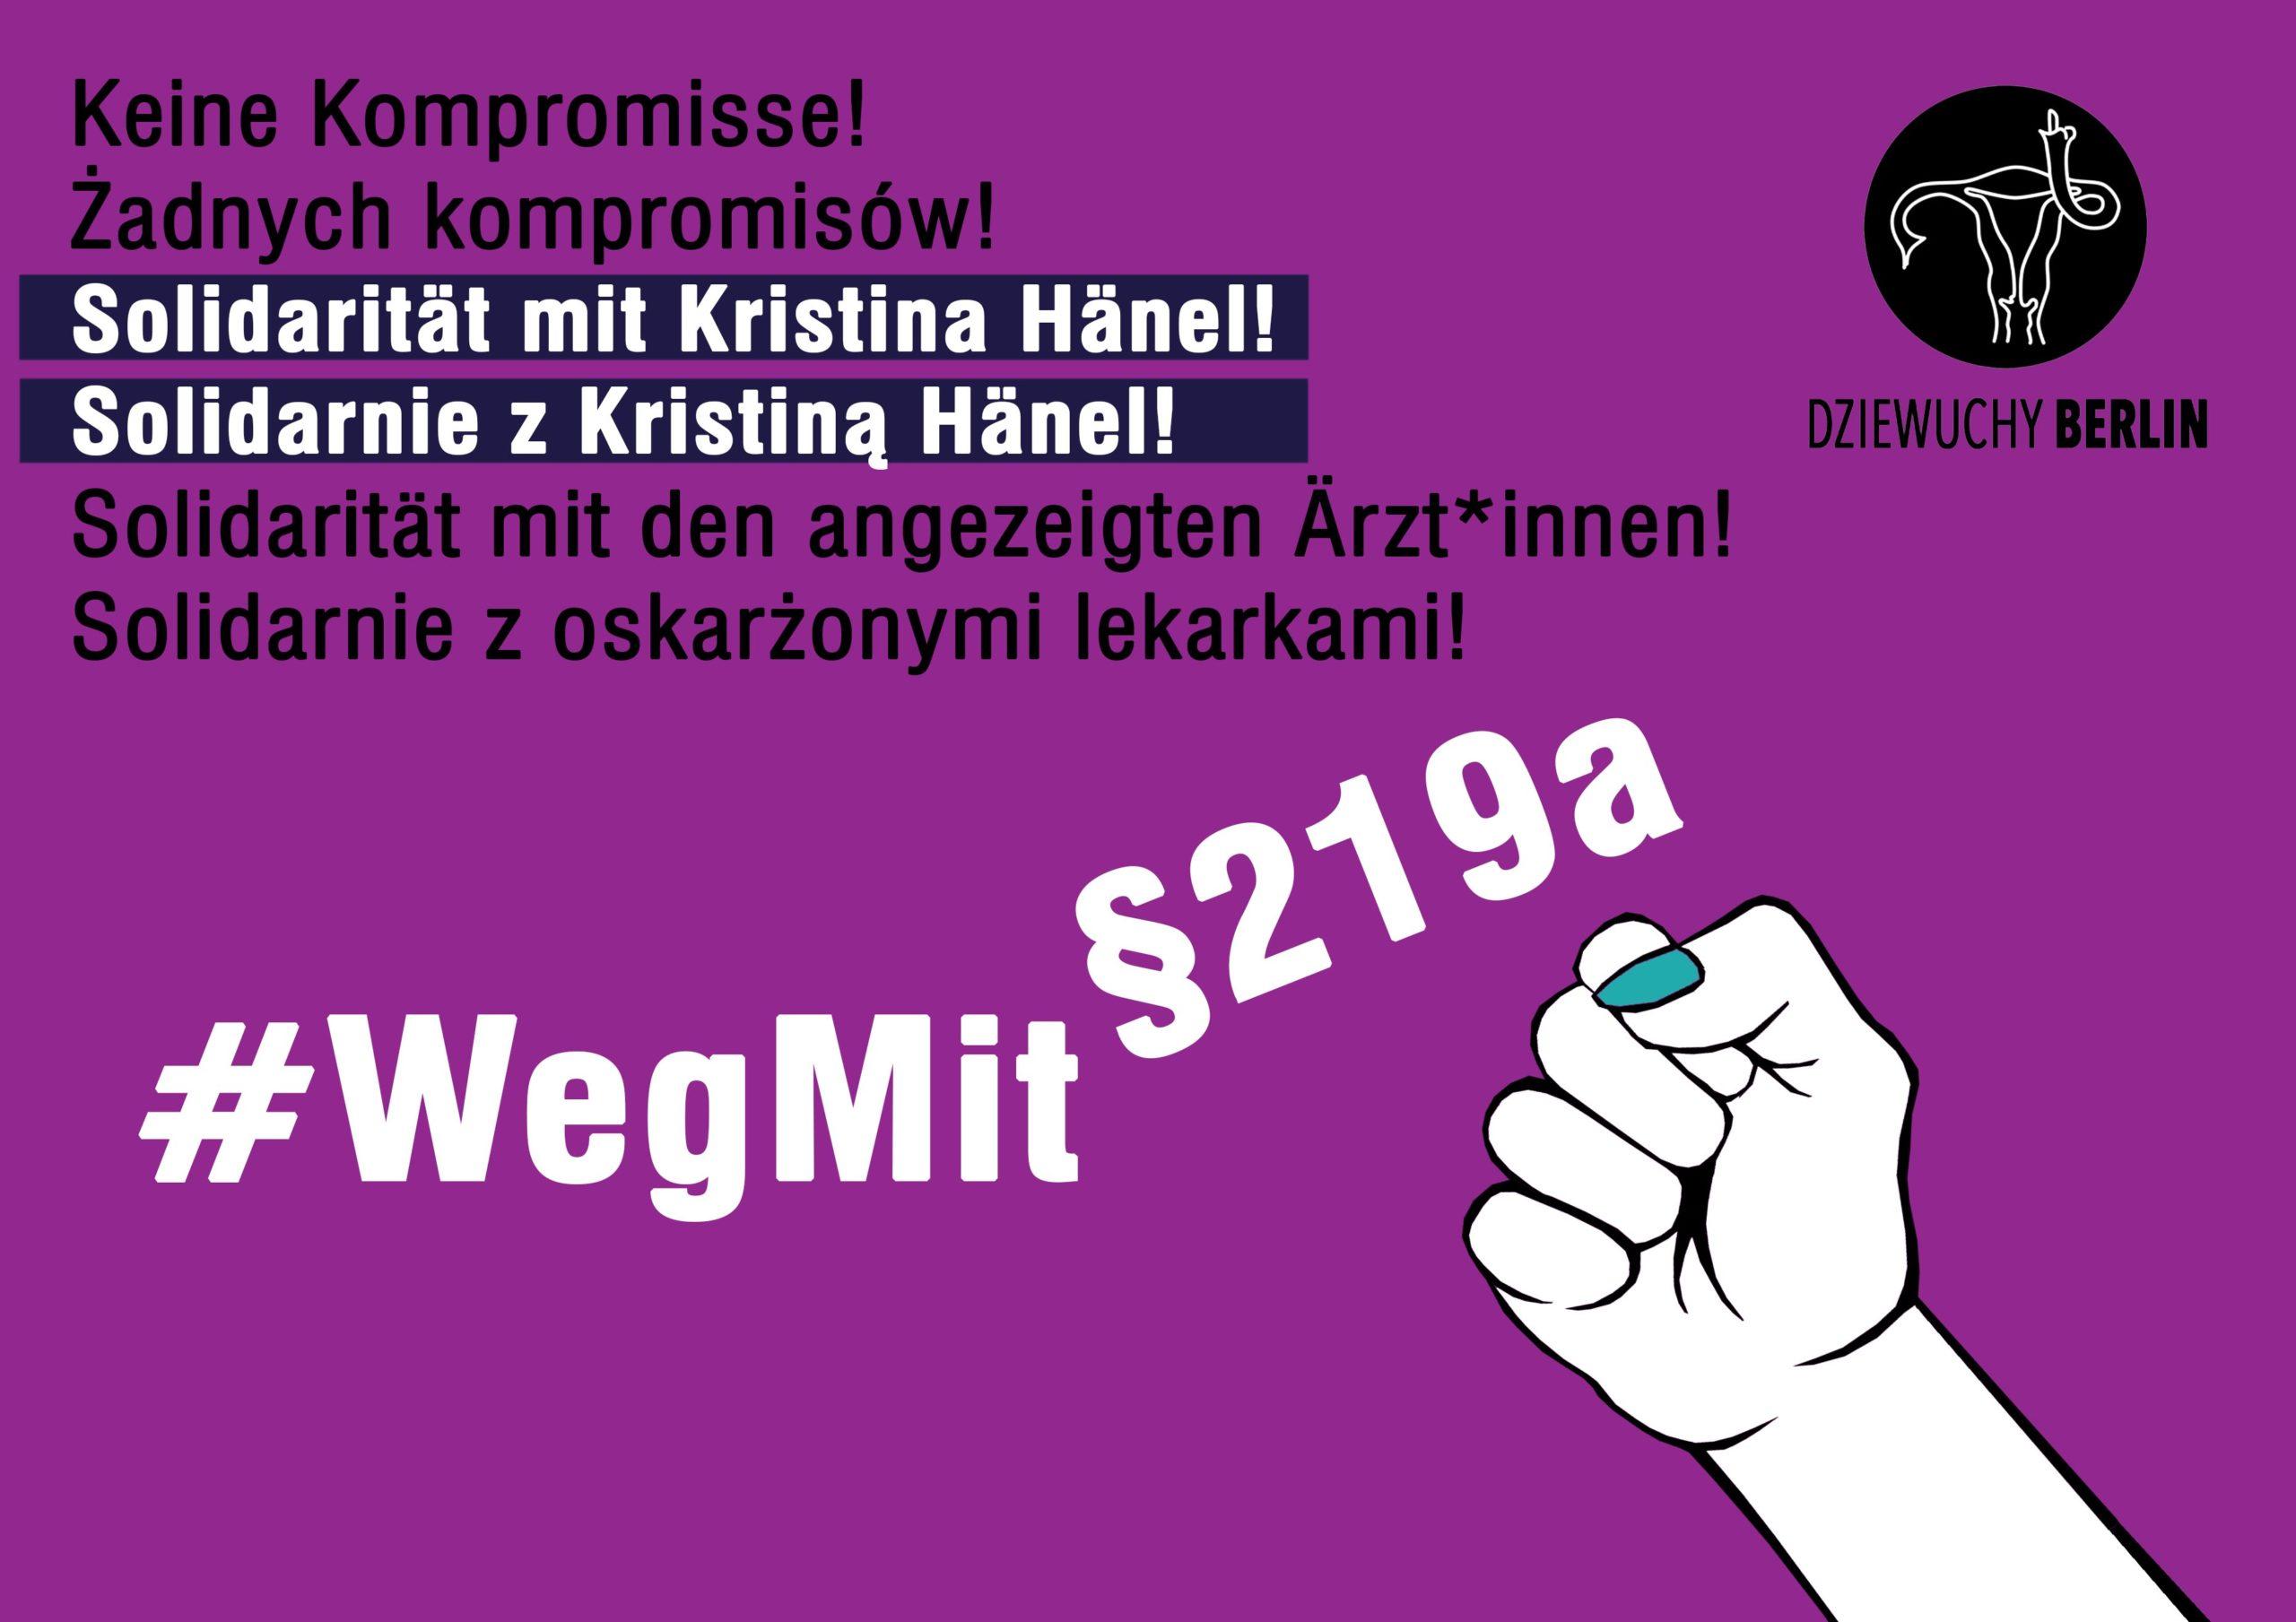 Solidarnie z lekarką Kristiną Hänel | In solidarity with doctor  Kristina Hänel | Weg mit 219a